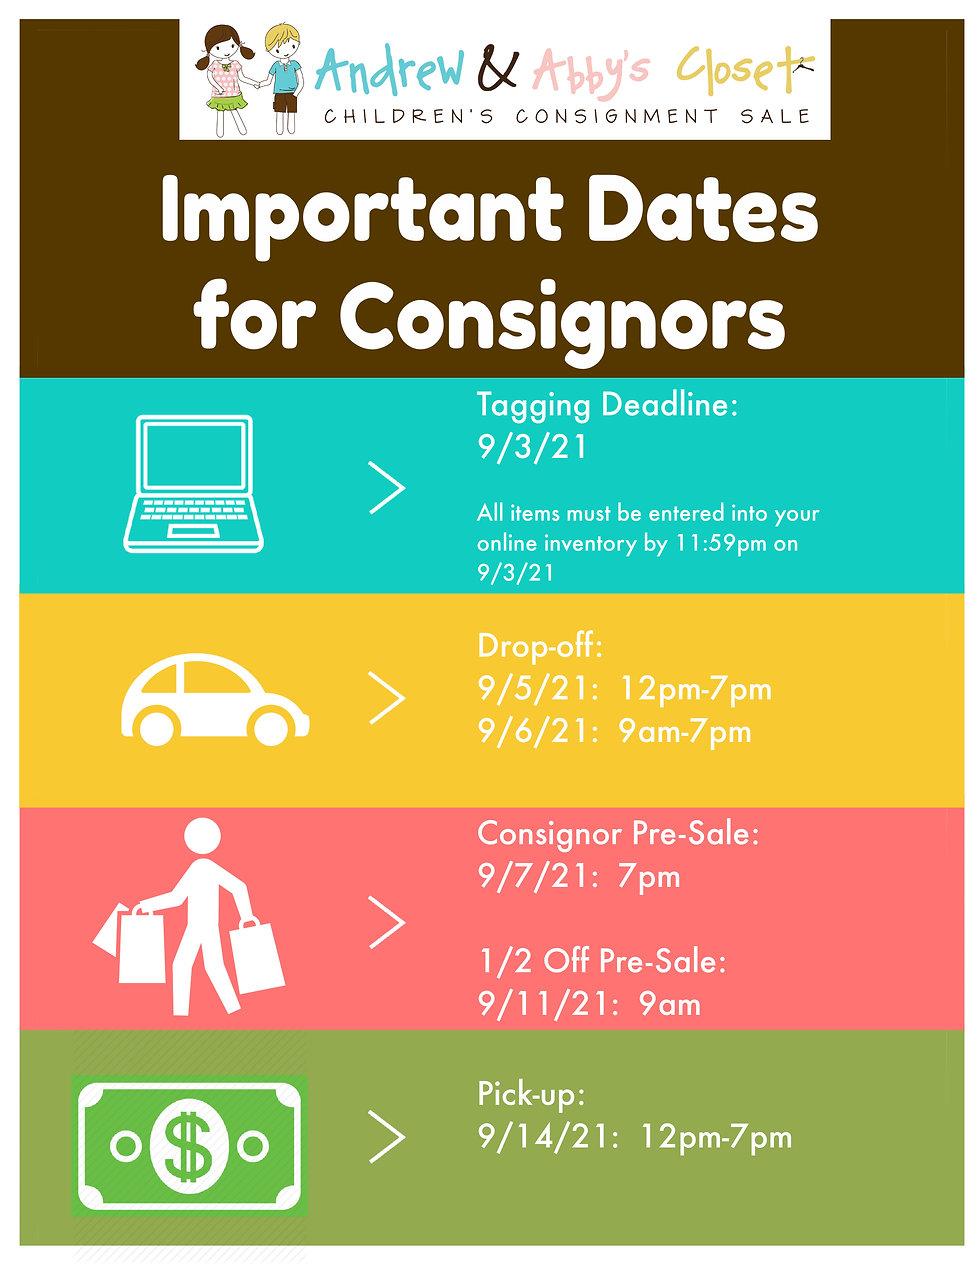 Important Consignor Dates Fall 21 copy (1).jpg